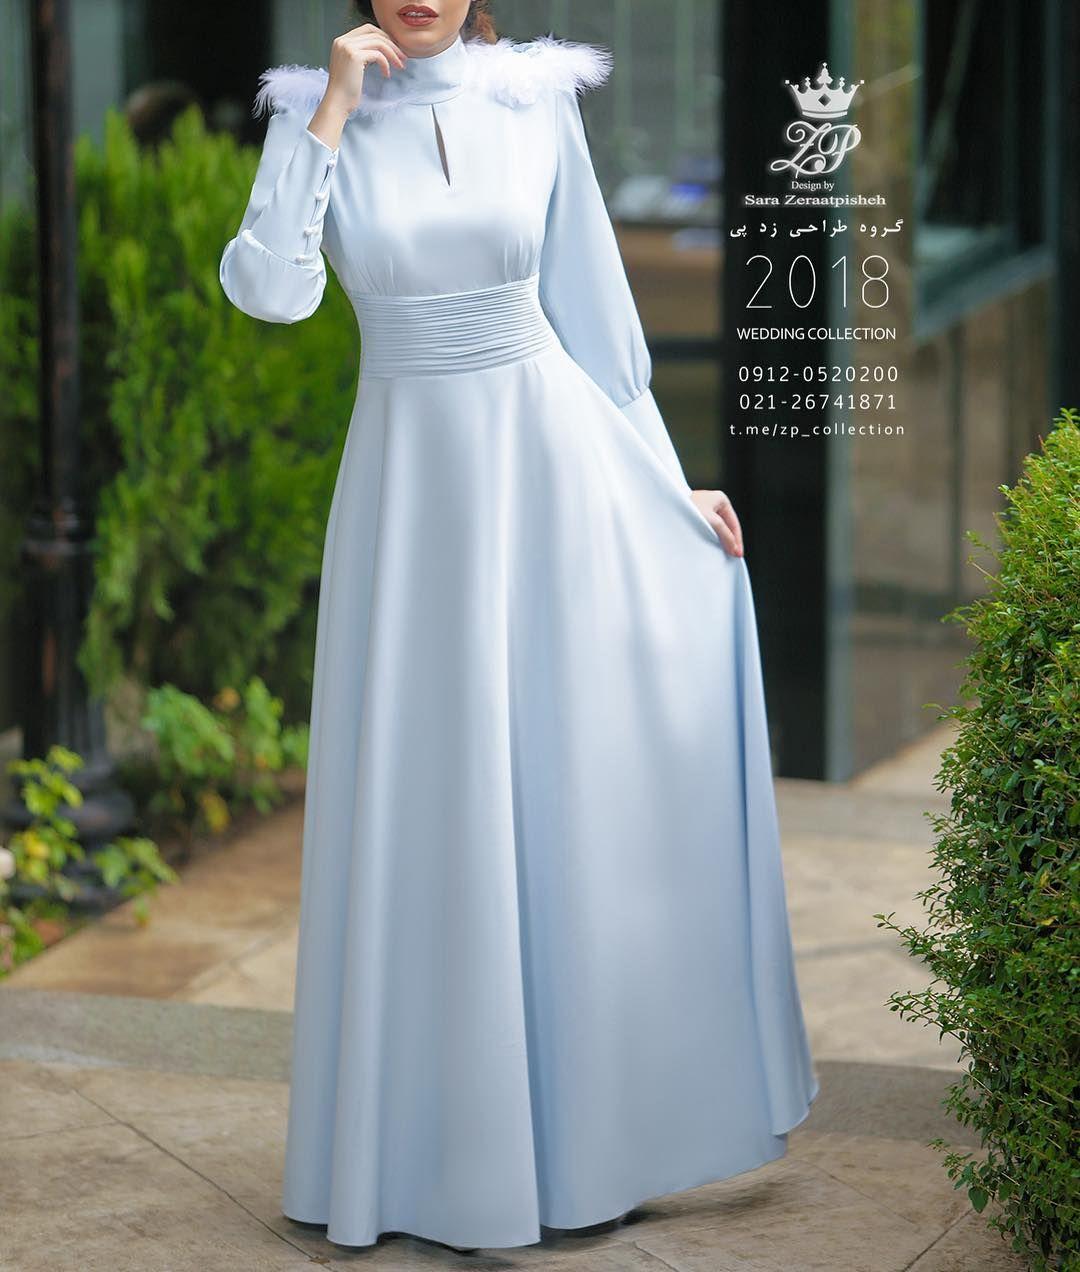 f71557f55a Pin by SayoOo on Dresses in 2019 | Dresses, Formal dresses, Wedding dresses